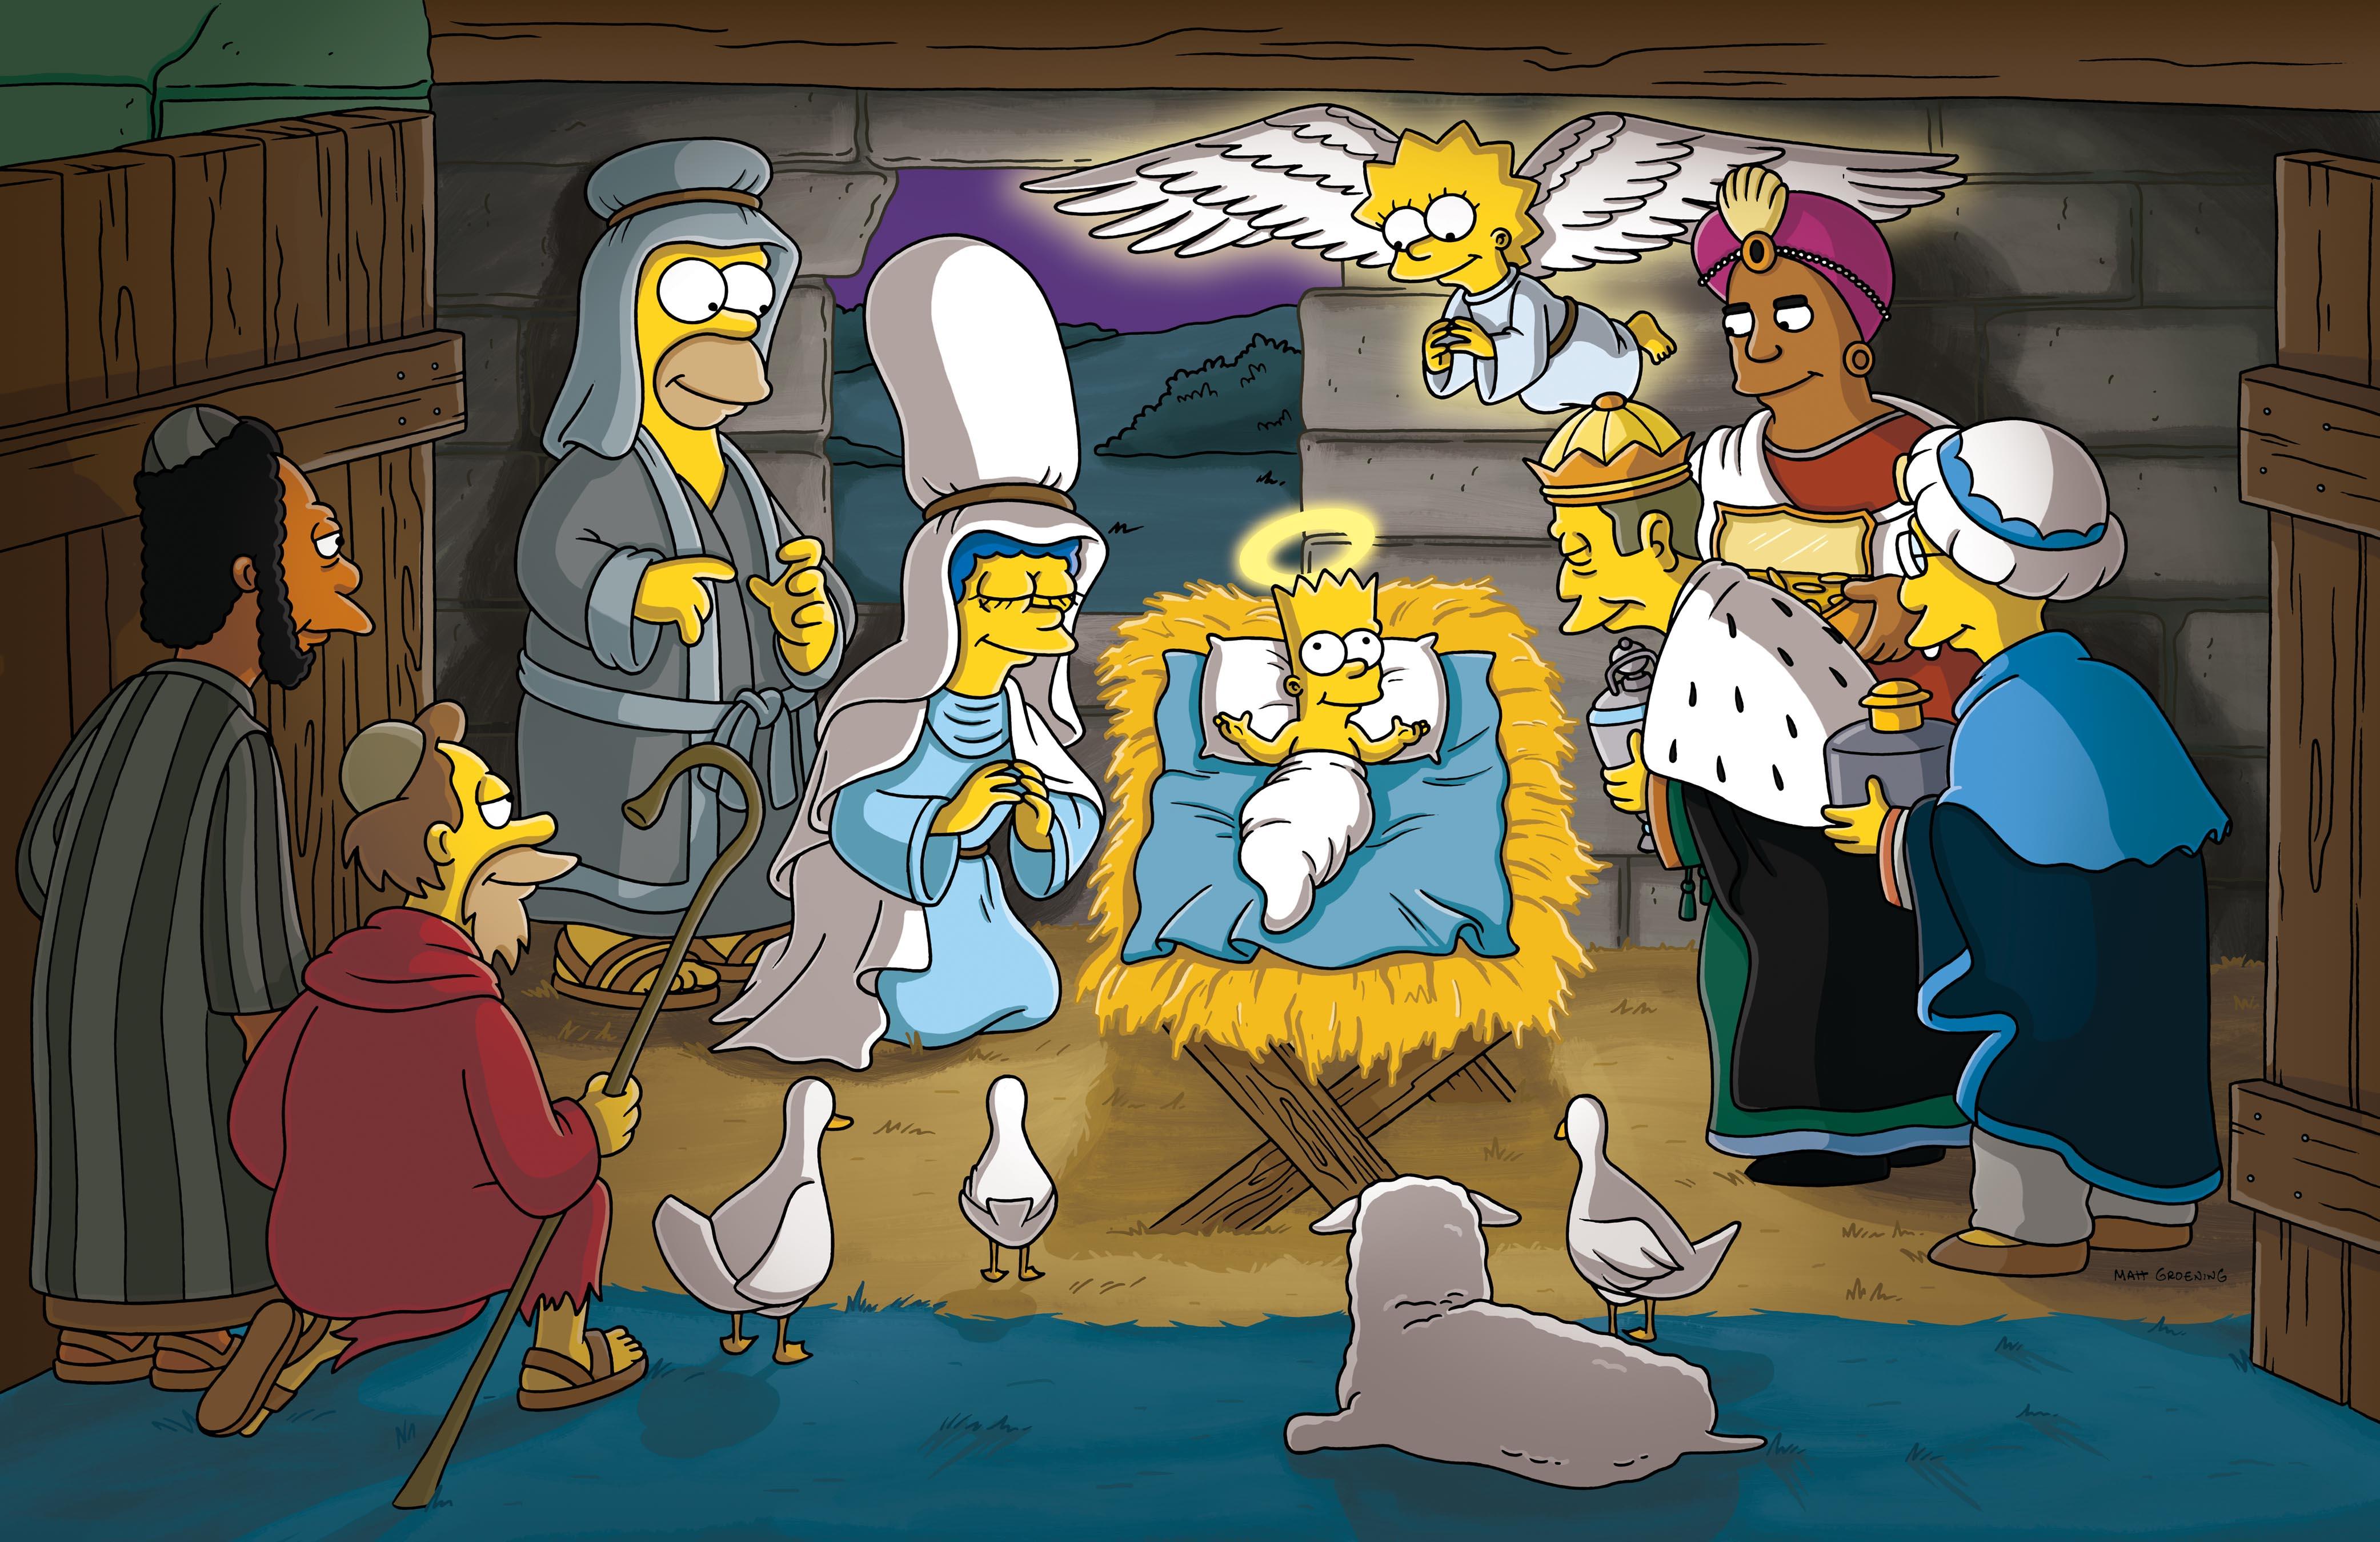 http://vignette1.wikia.nocookie.net/simpsons/images/c/c5/Simpson_Christmas_Stories_Promo.jpg/revision/latest?cb=20120311062856